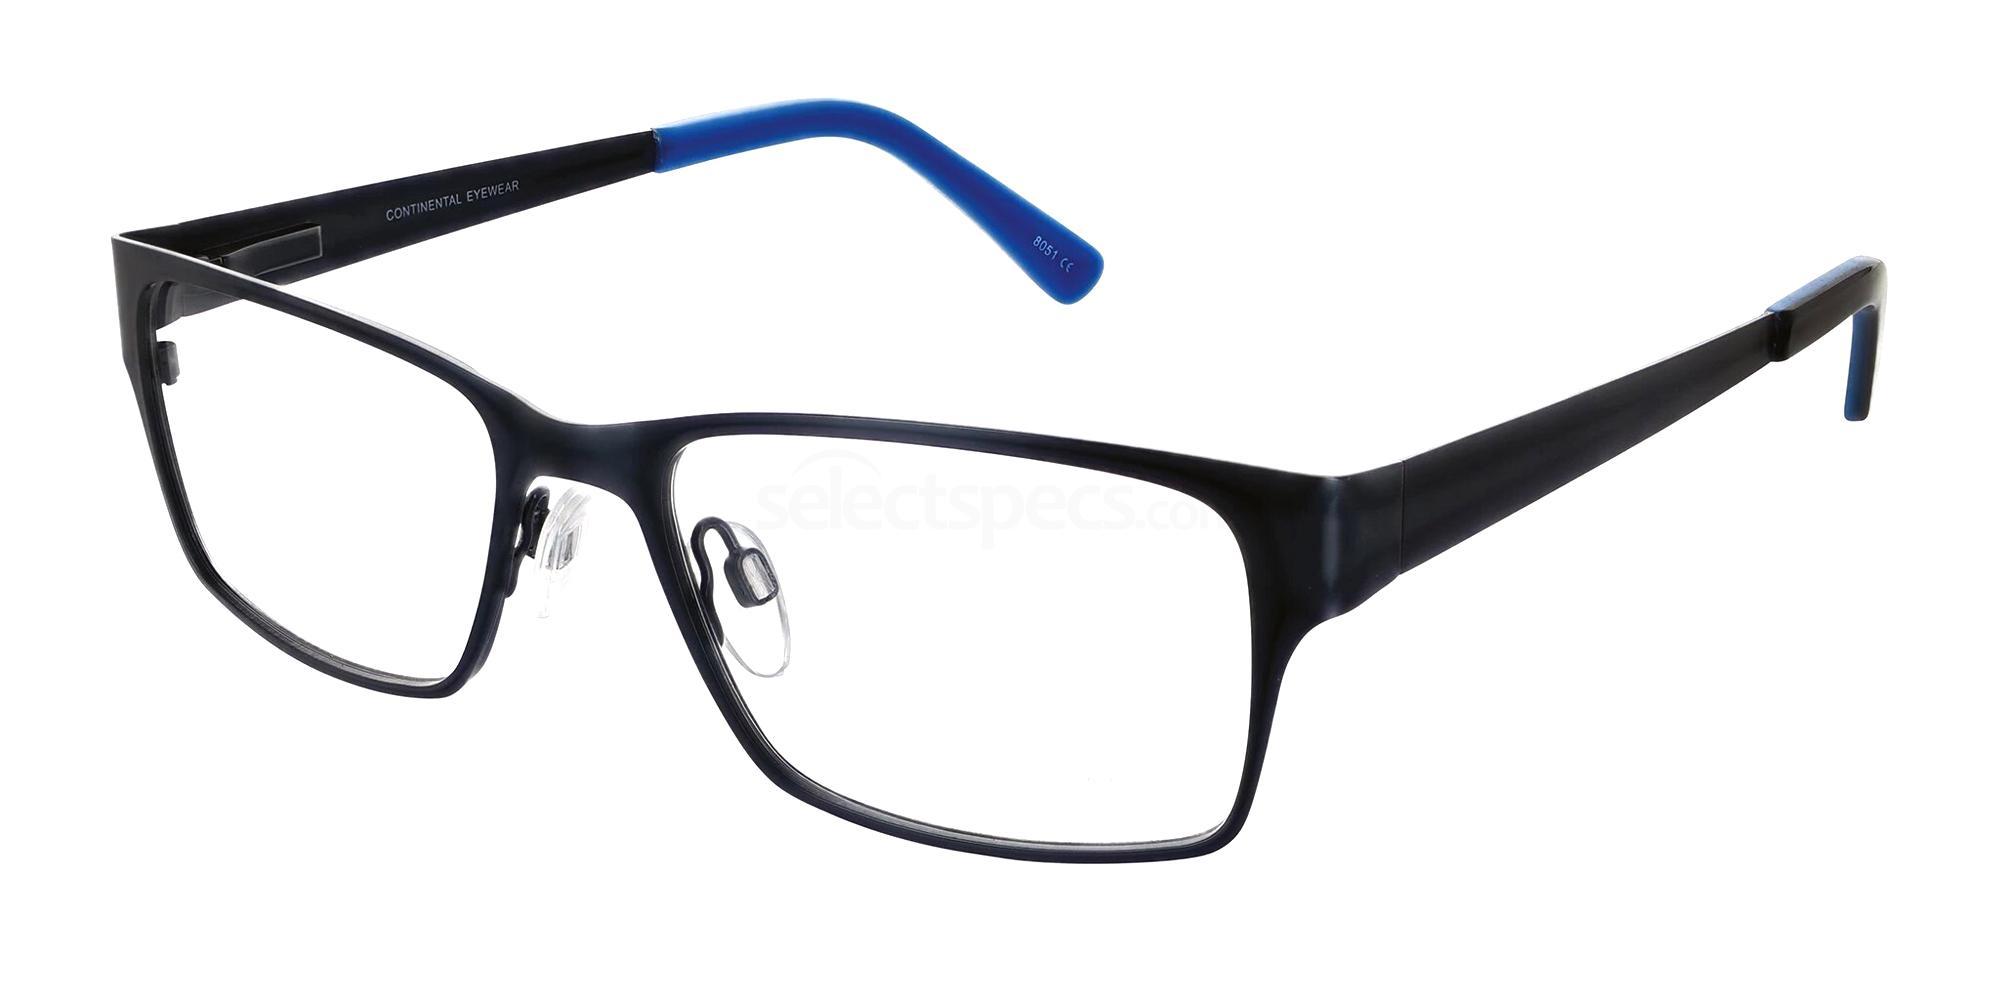 Denim 78 Glasses, Zenith Zest